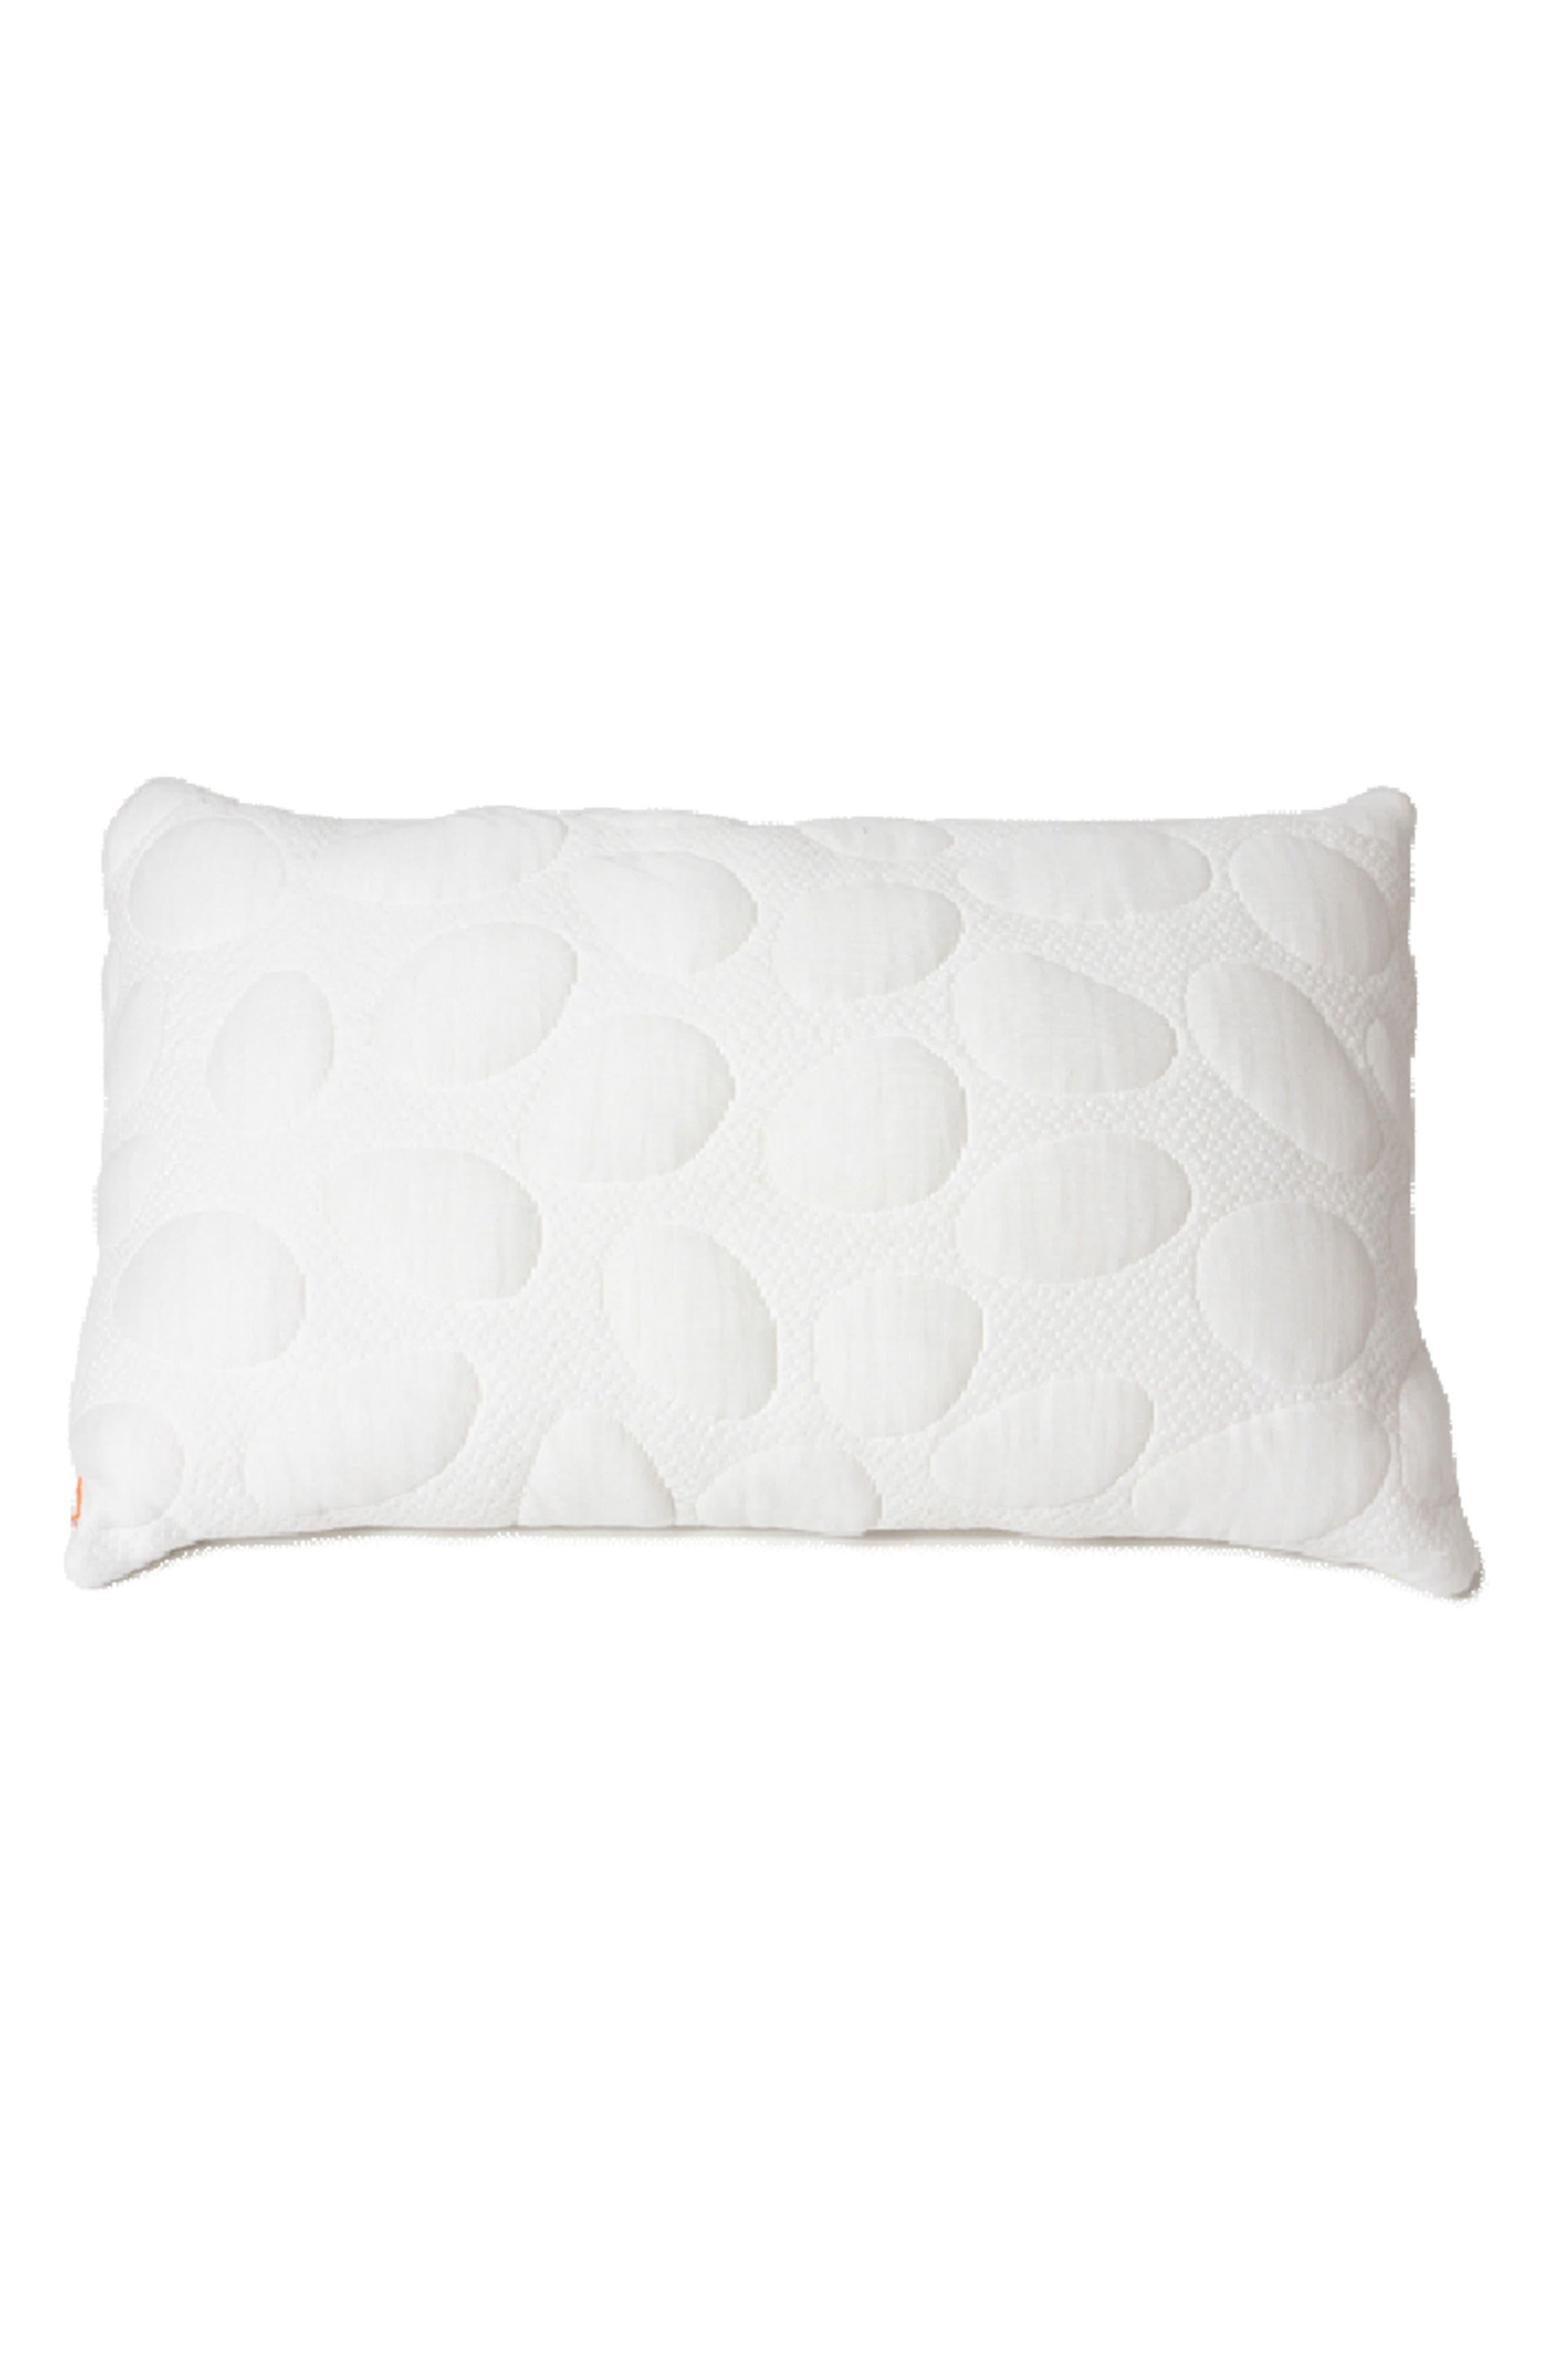 Nook Pebble Jr. Pillow